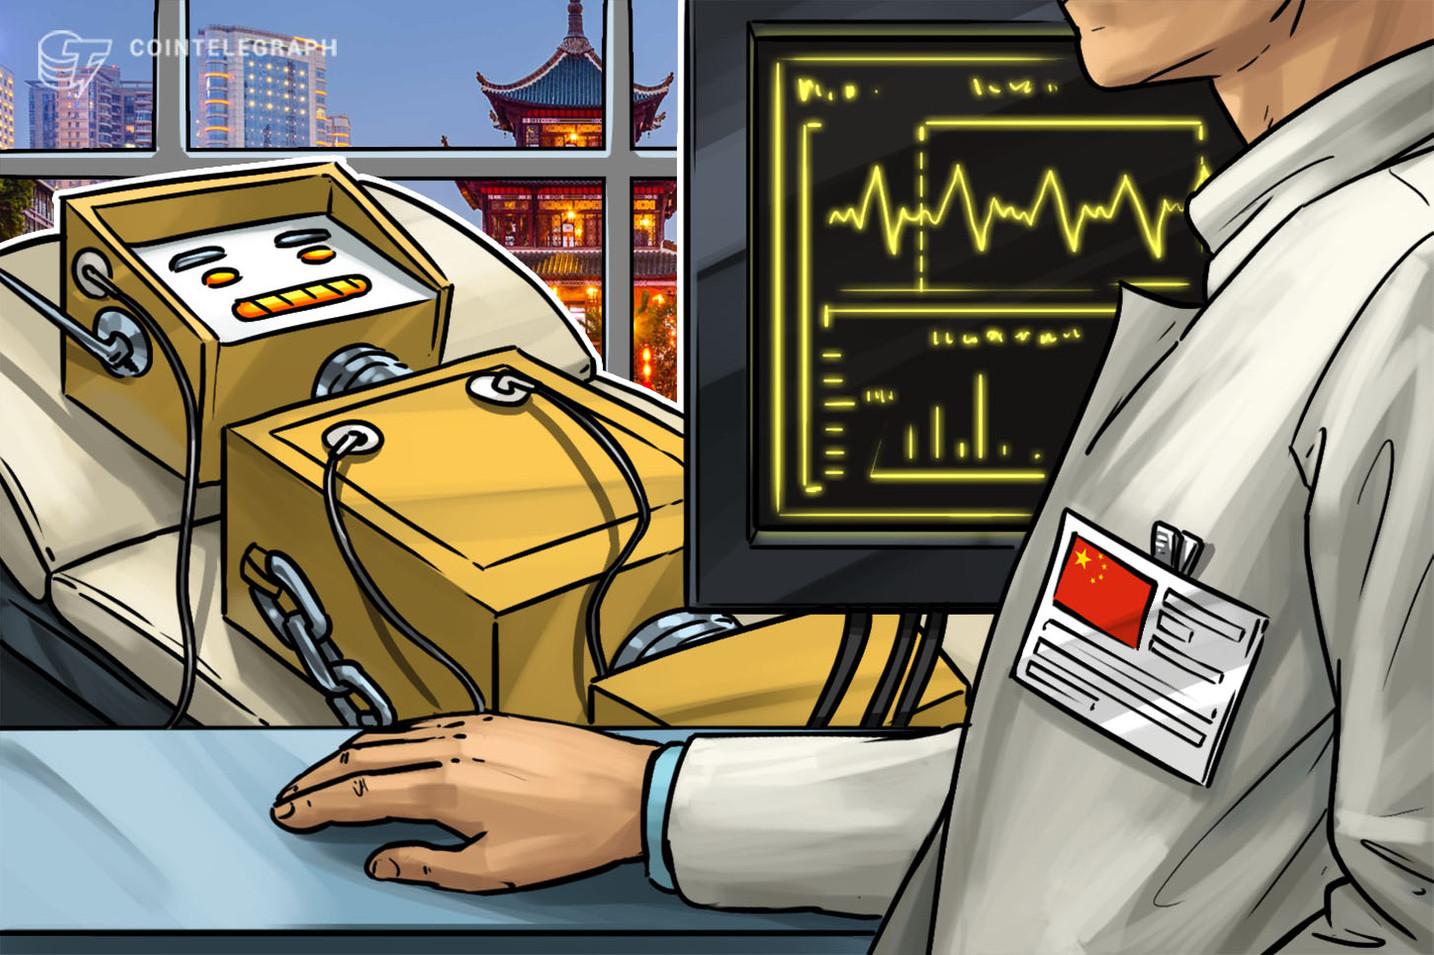 Informe de China: proyectos de Blockchain van de auge a quiebra en 15 meses